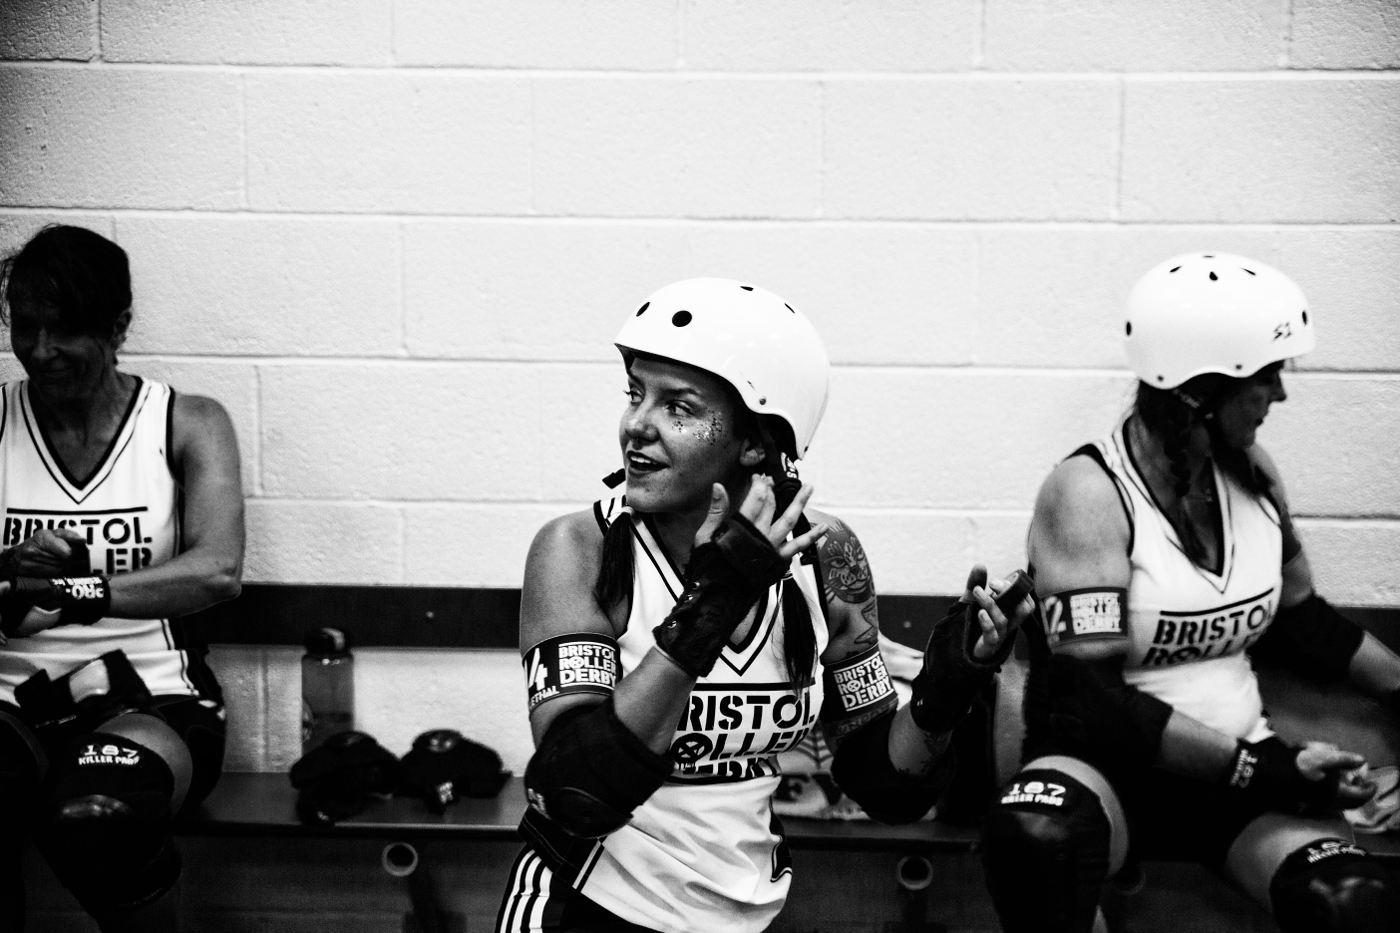 Glittery smiling women buckels up her helmet on the side lines